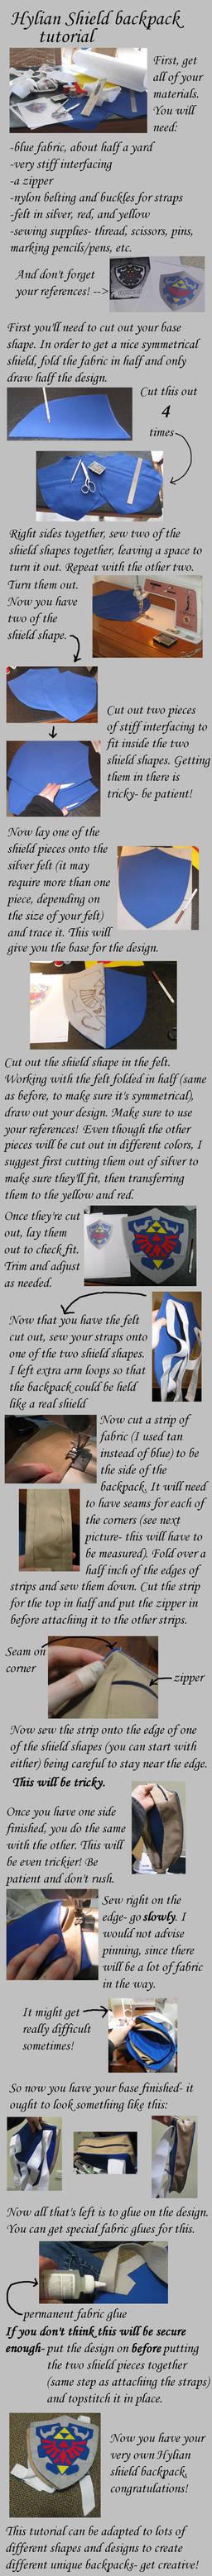 Zelda shield backpack tutorial